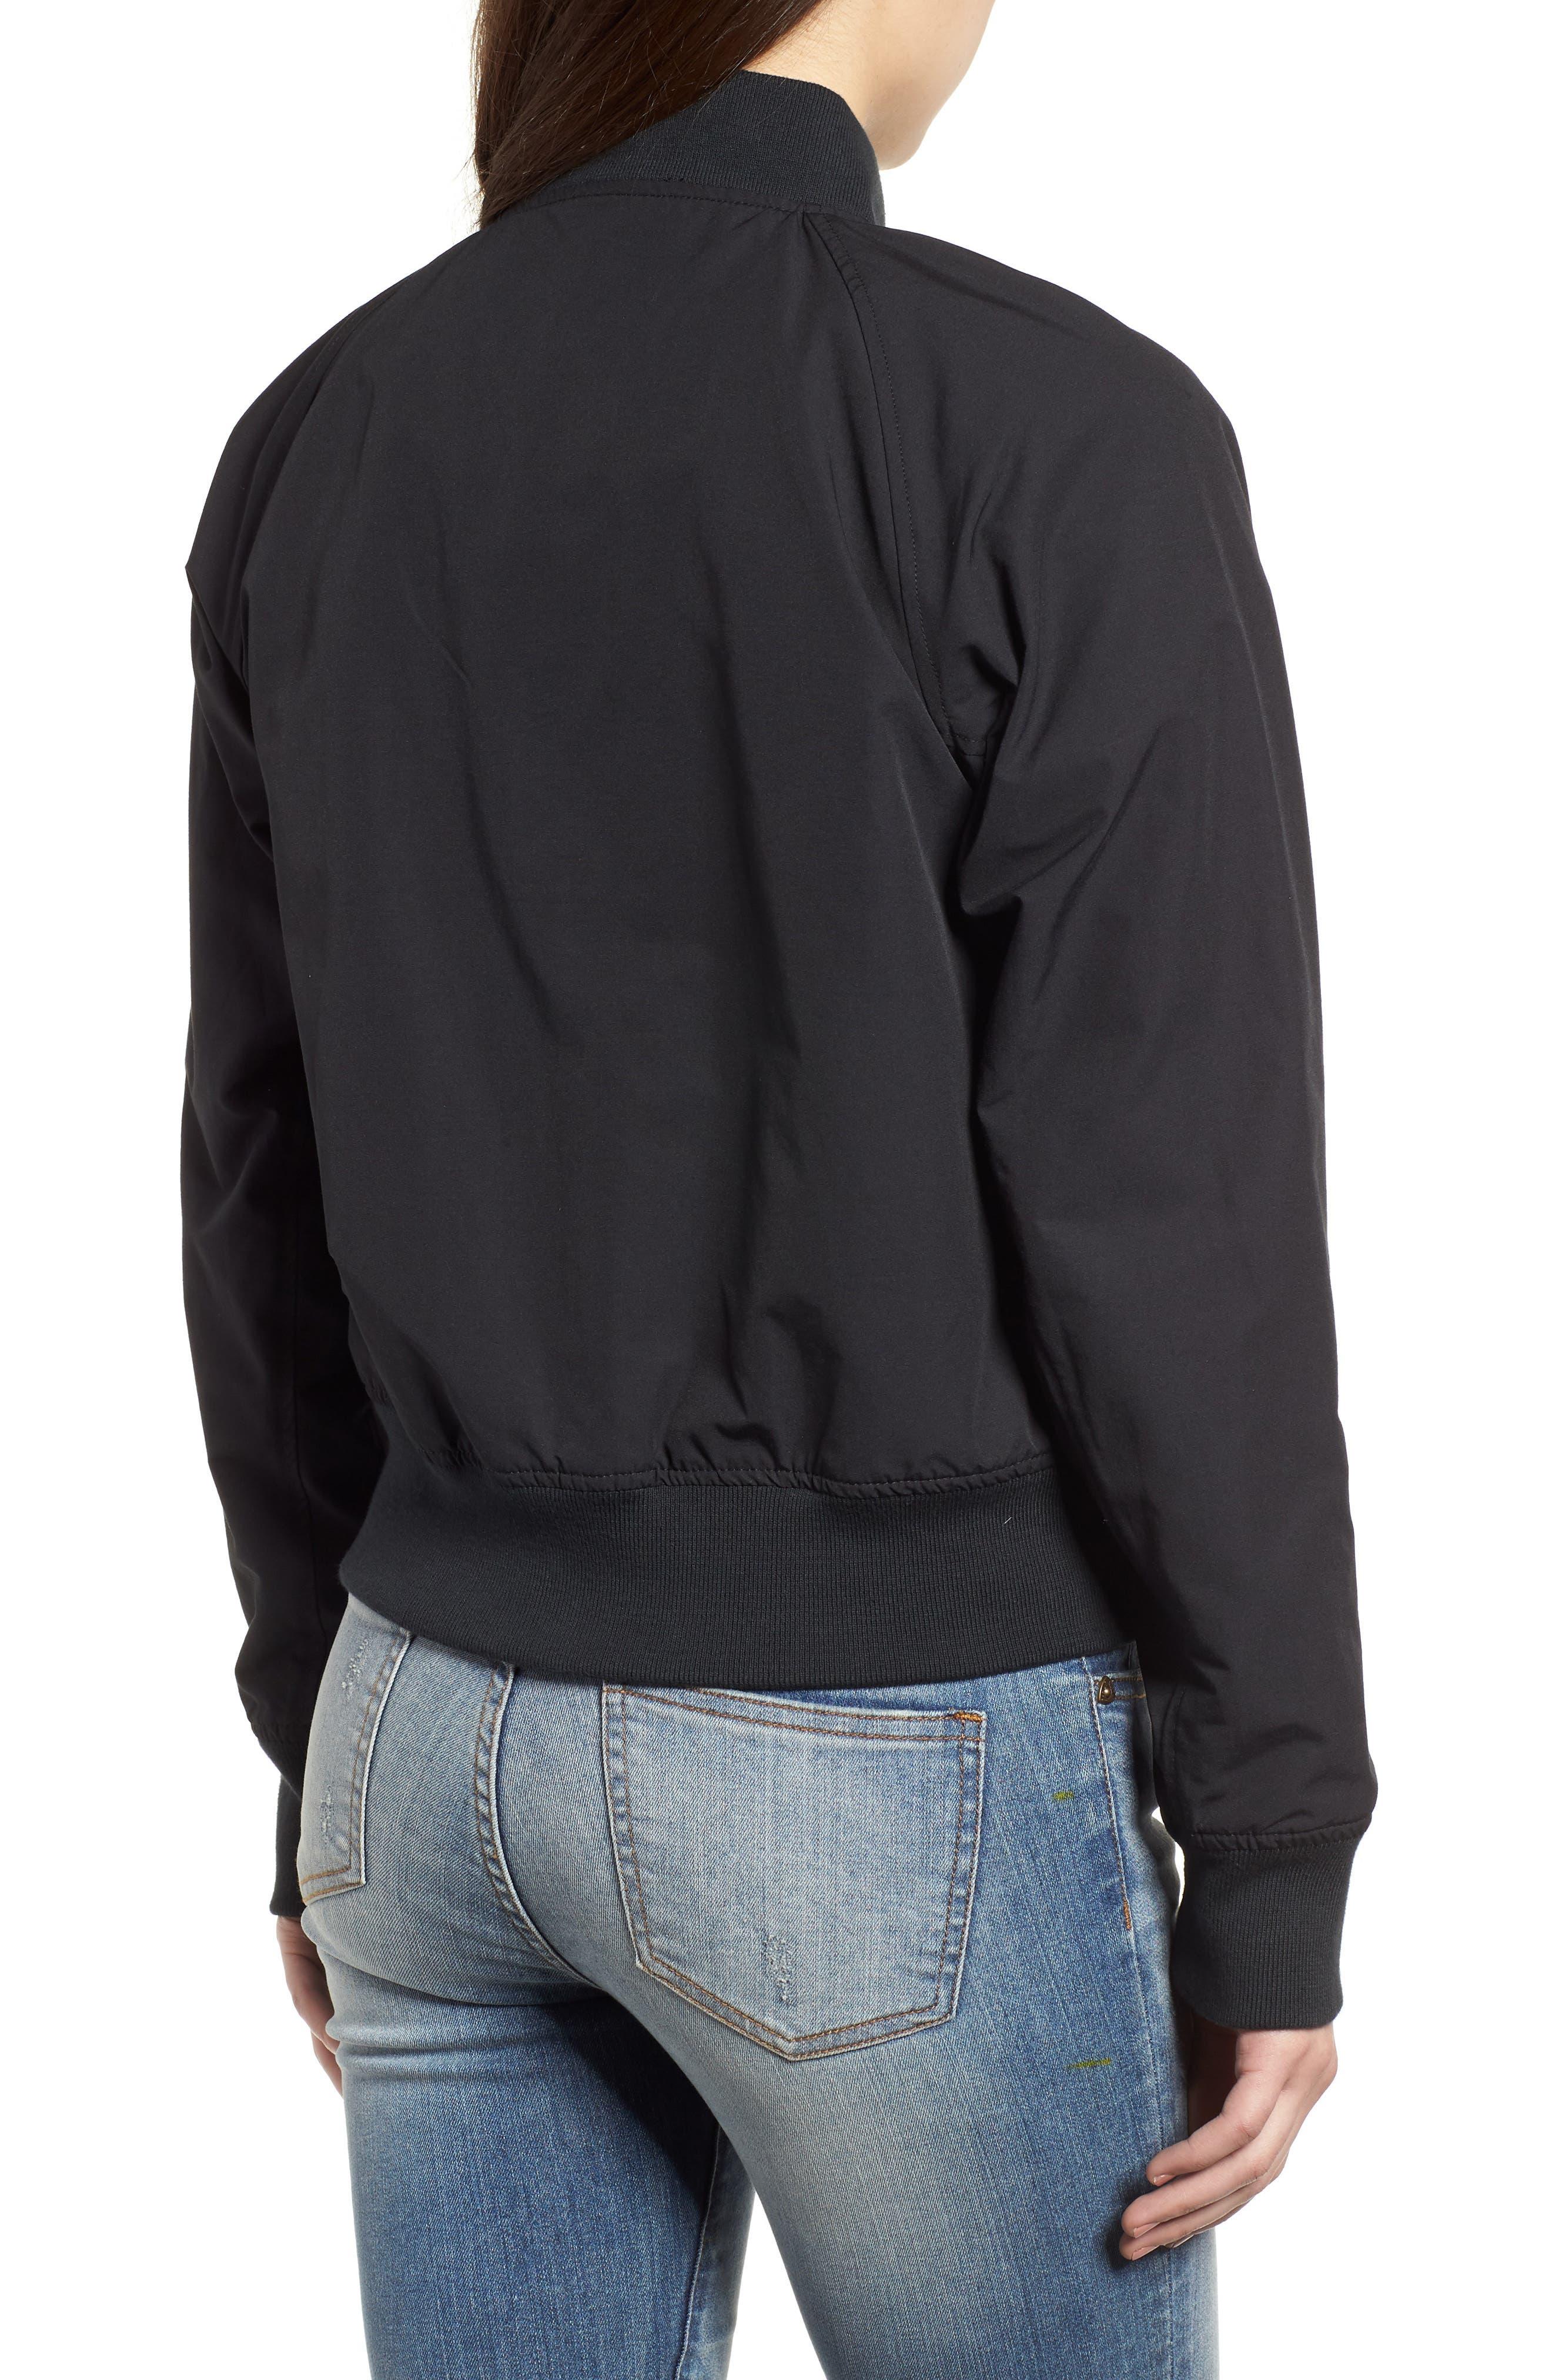 Varsity Jacket,                             Alternate thumbnail 2, color,                             Black/ Shadow